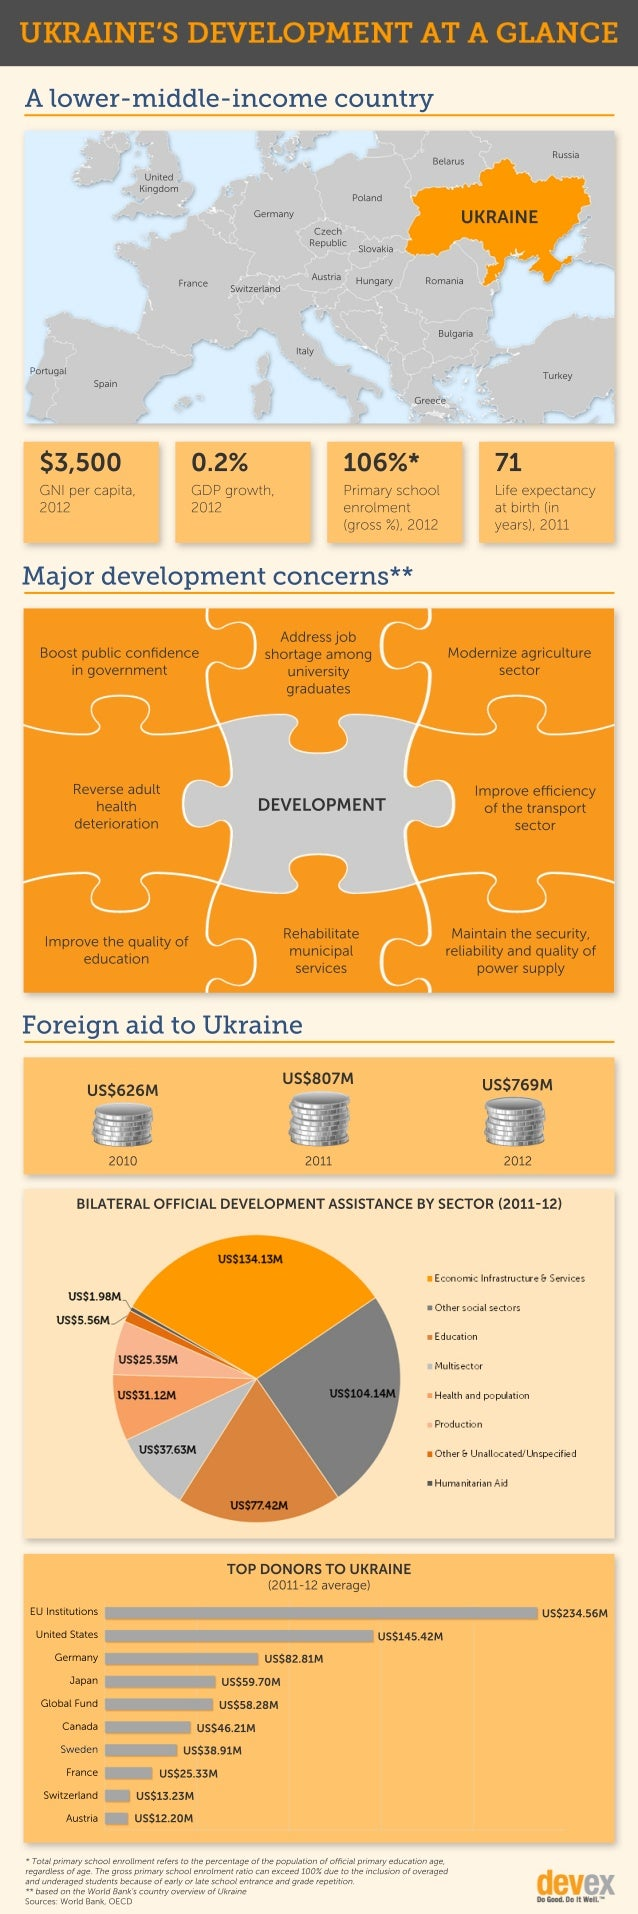 Ukraine's development at a glance